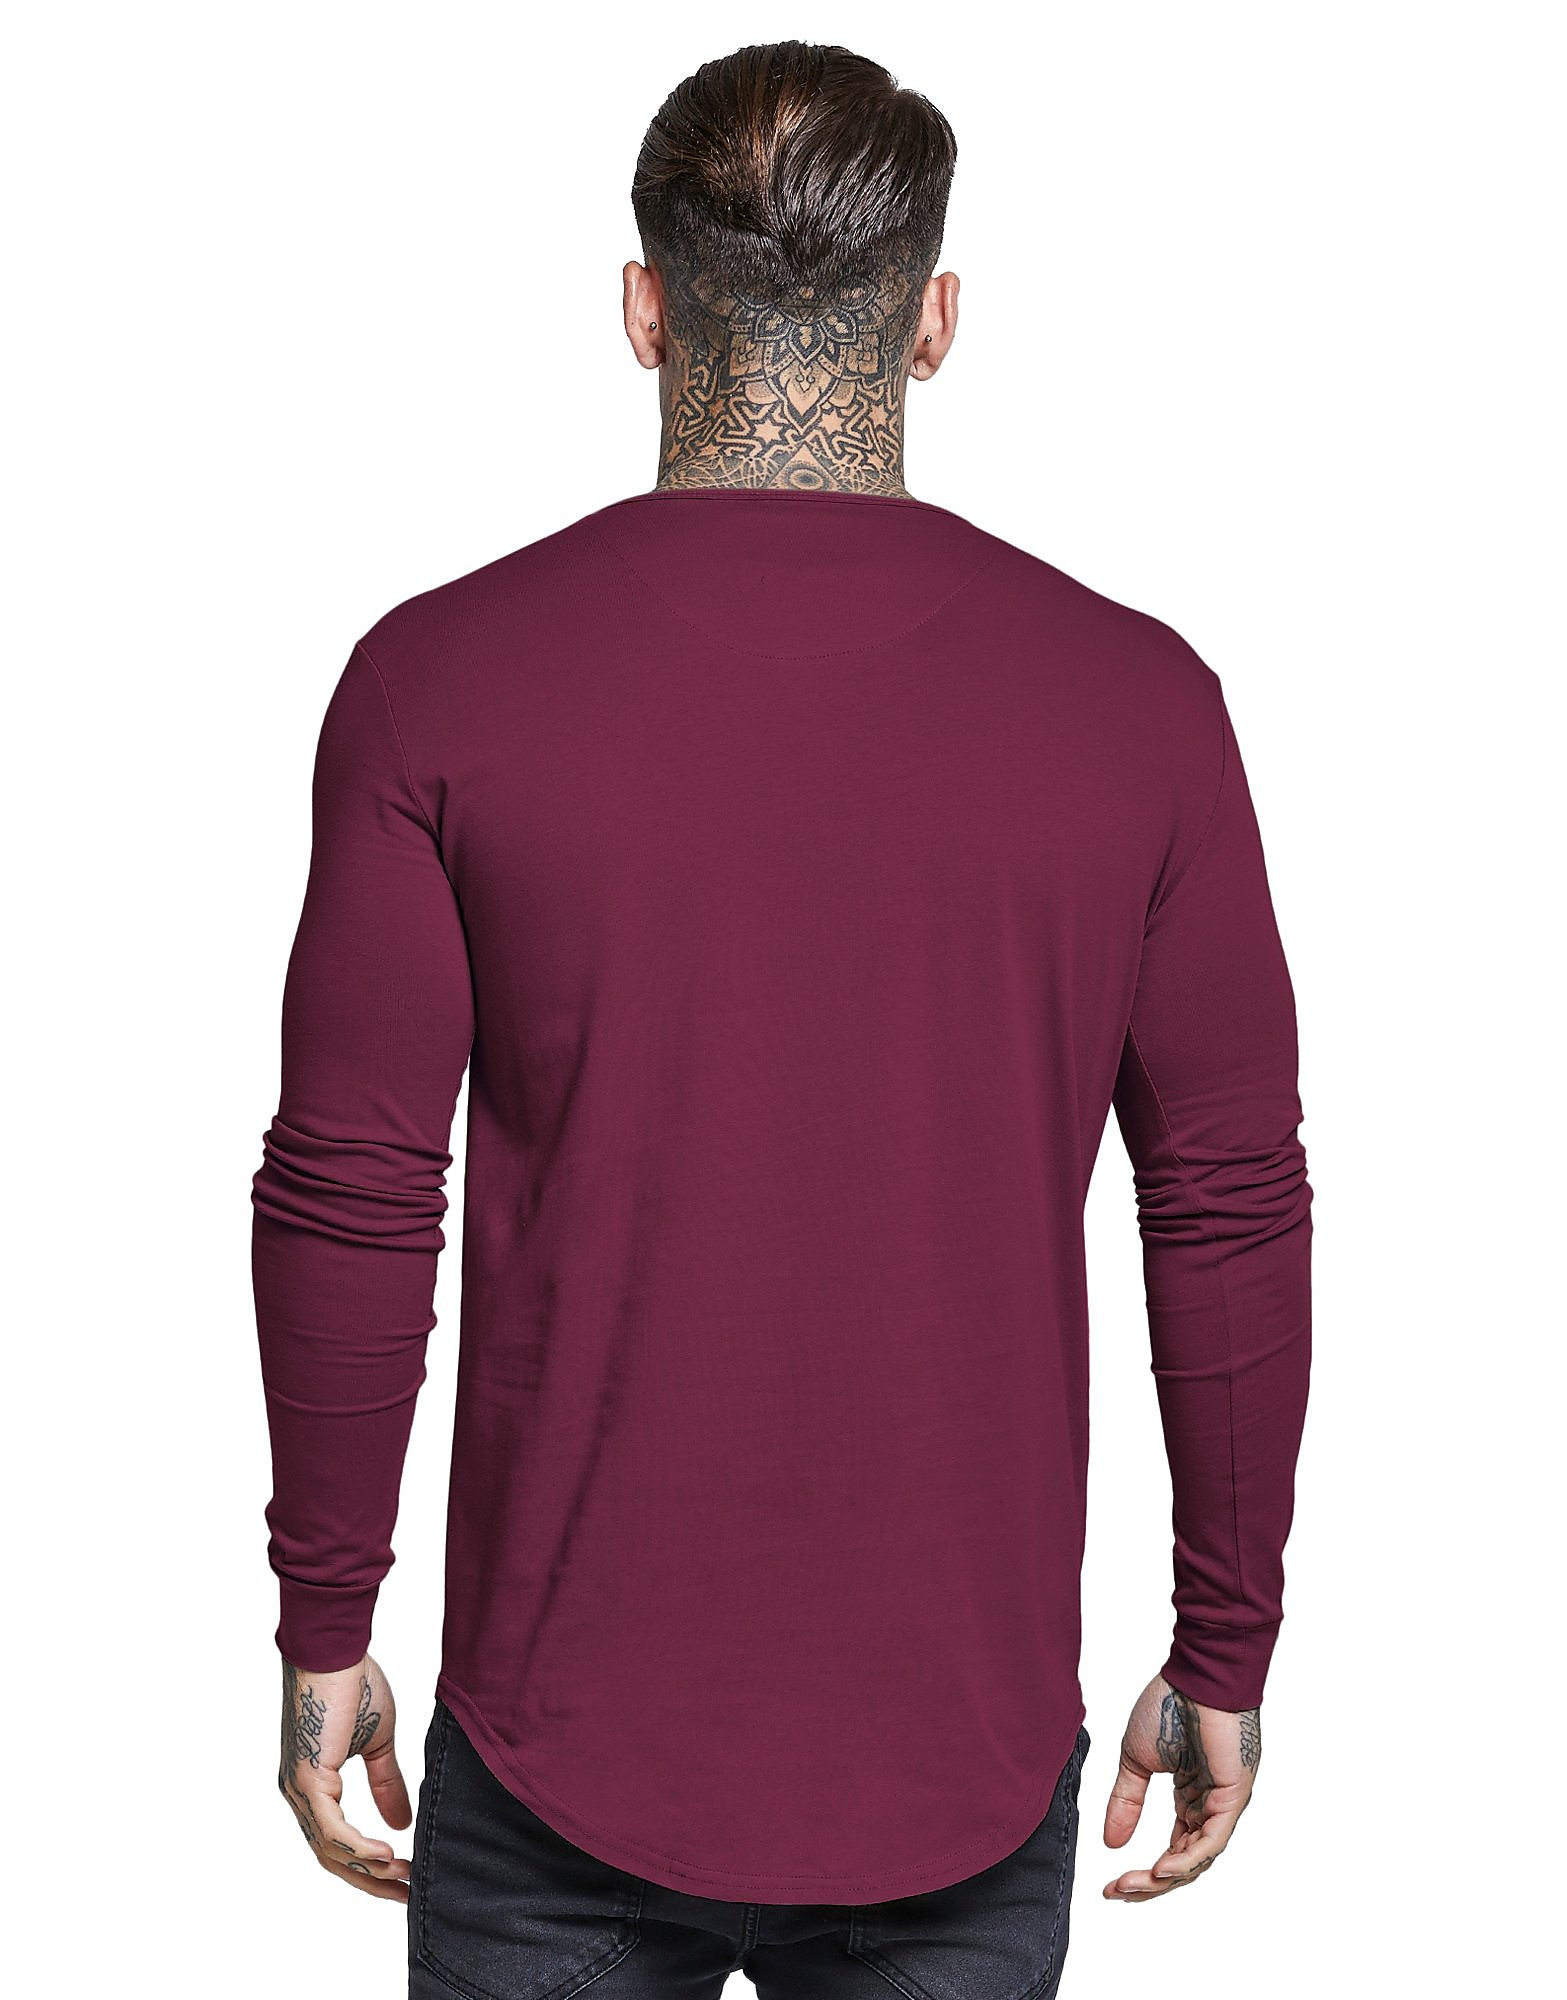 SikSilk T-shirt Long Sleeve Core Homme